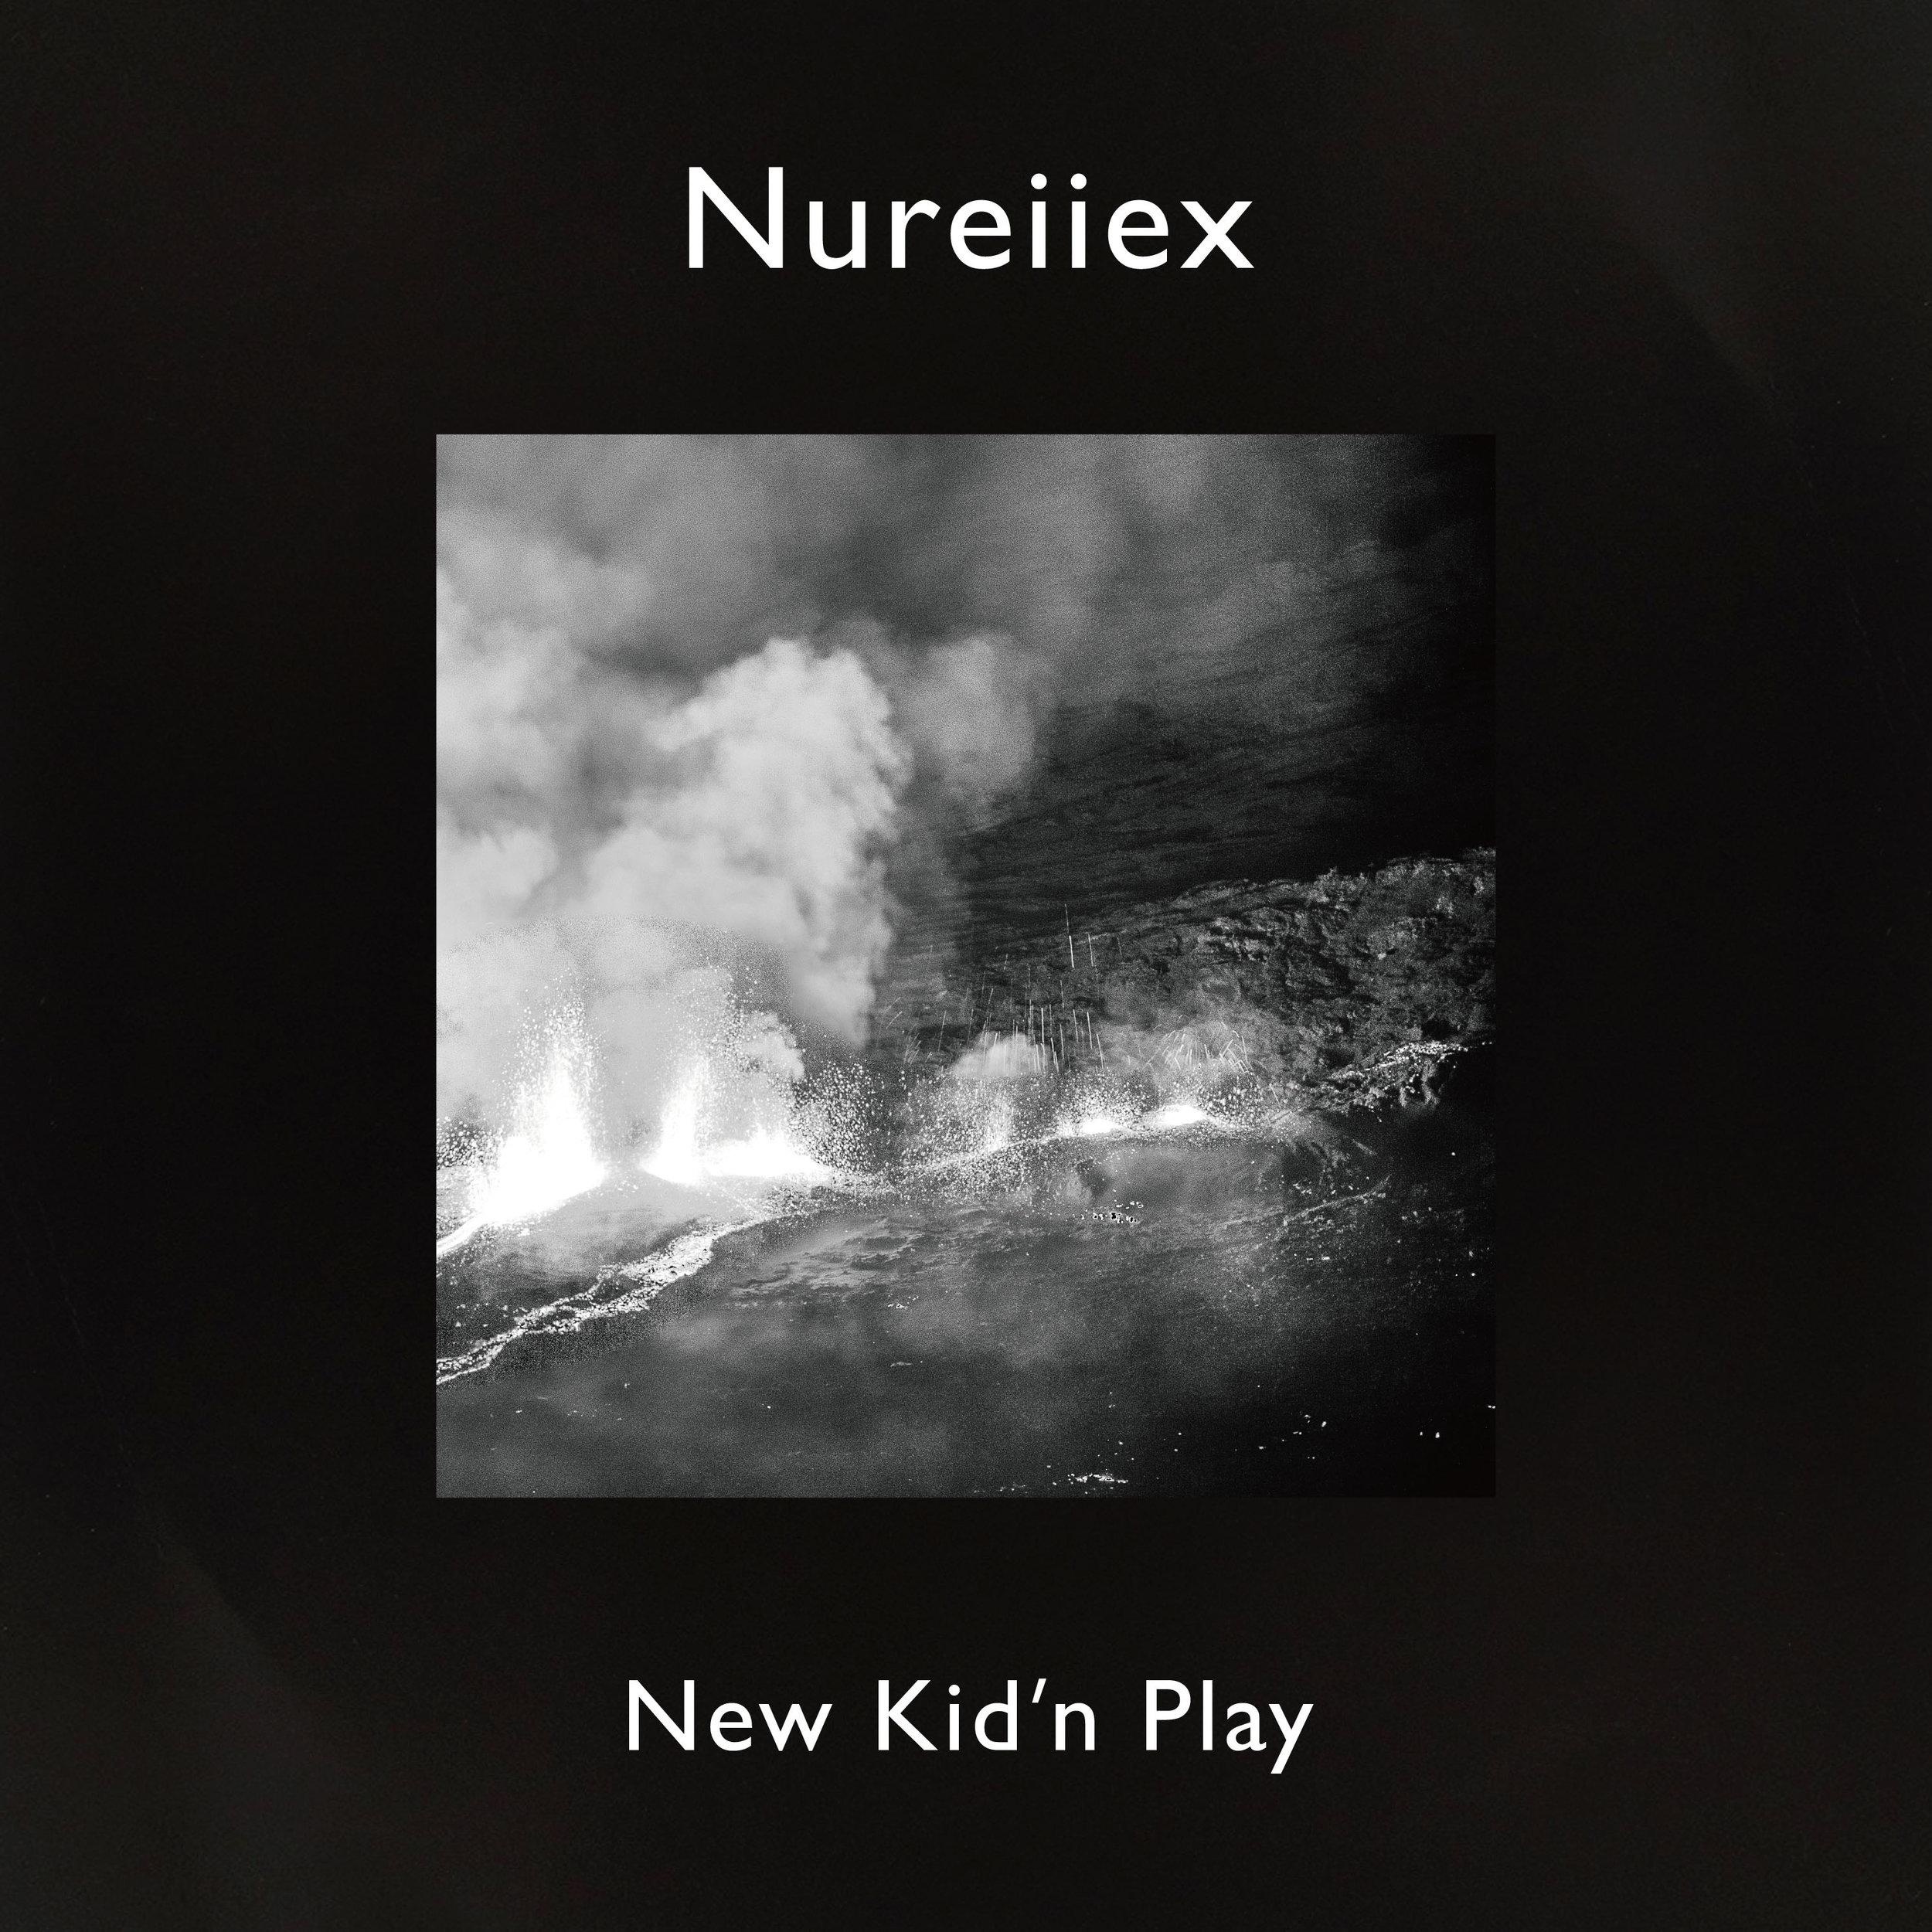 5th Aug 2019  Nureiiex / New Kid'n Play